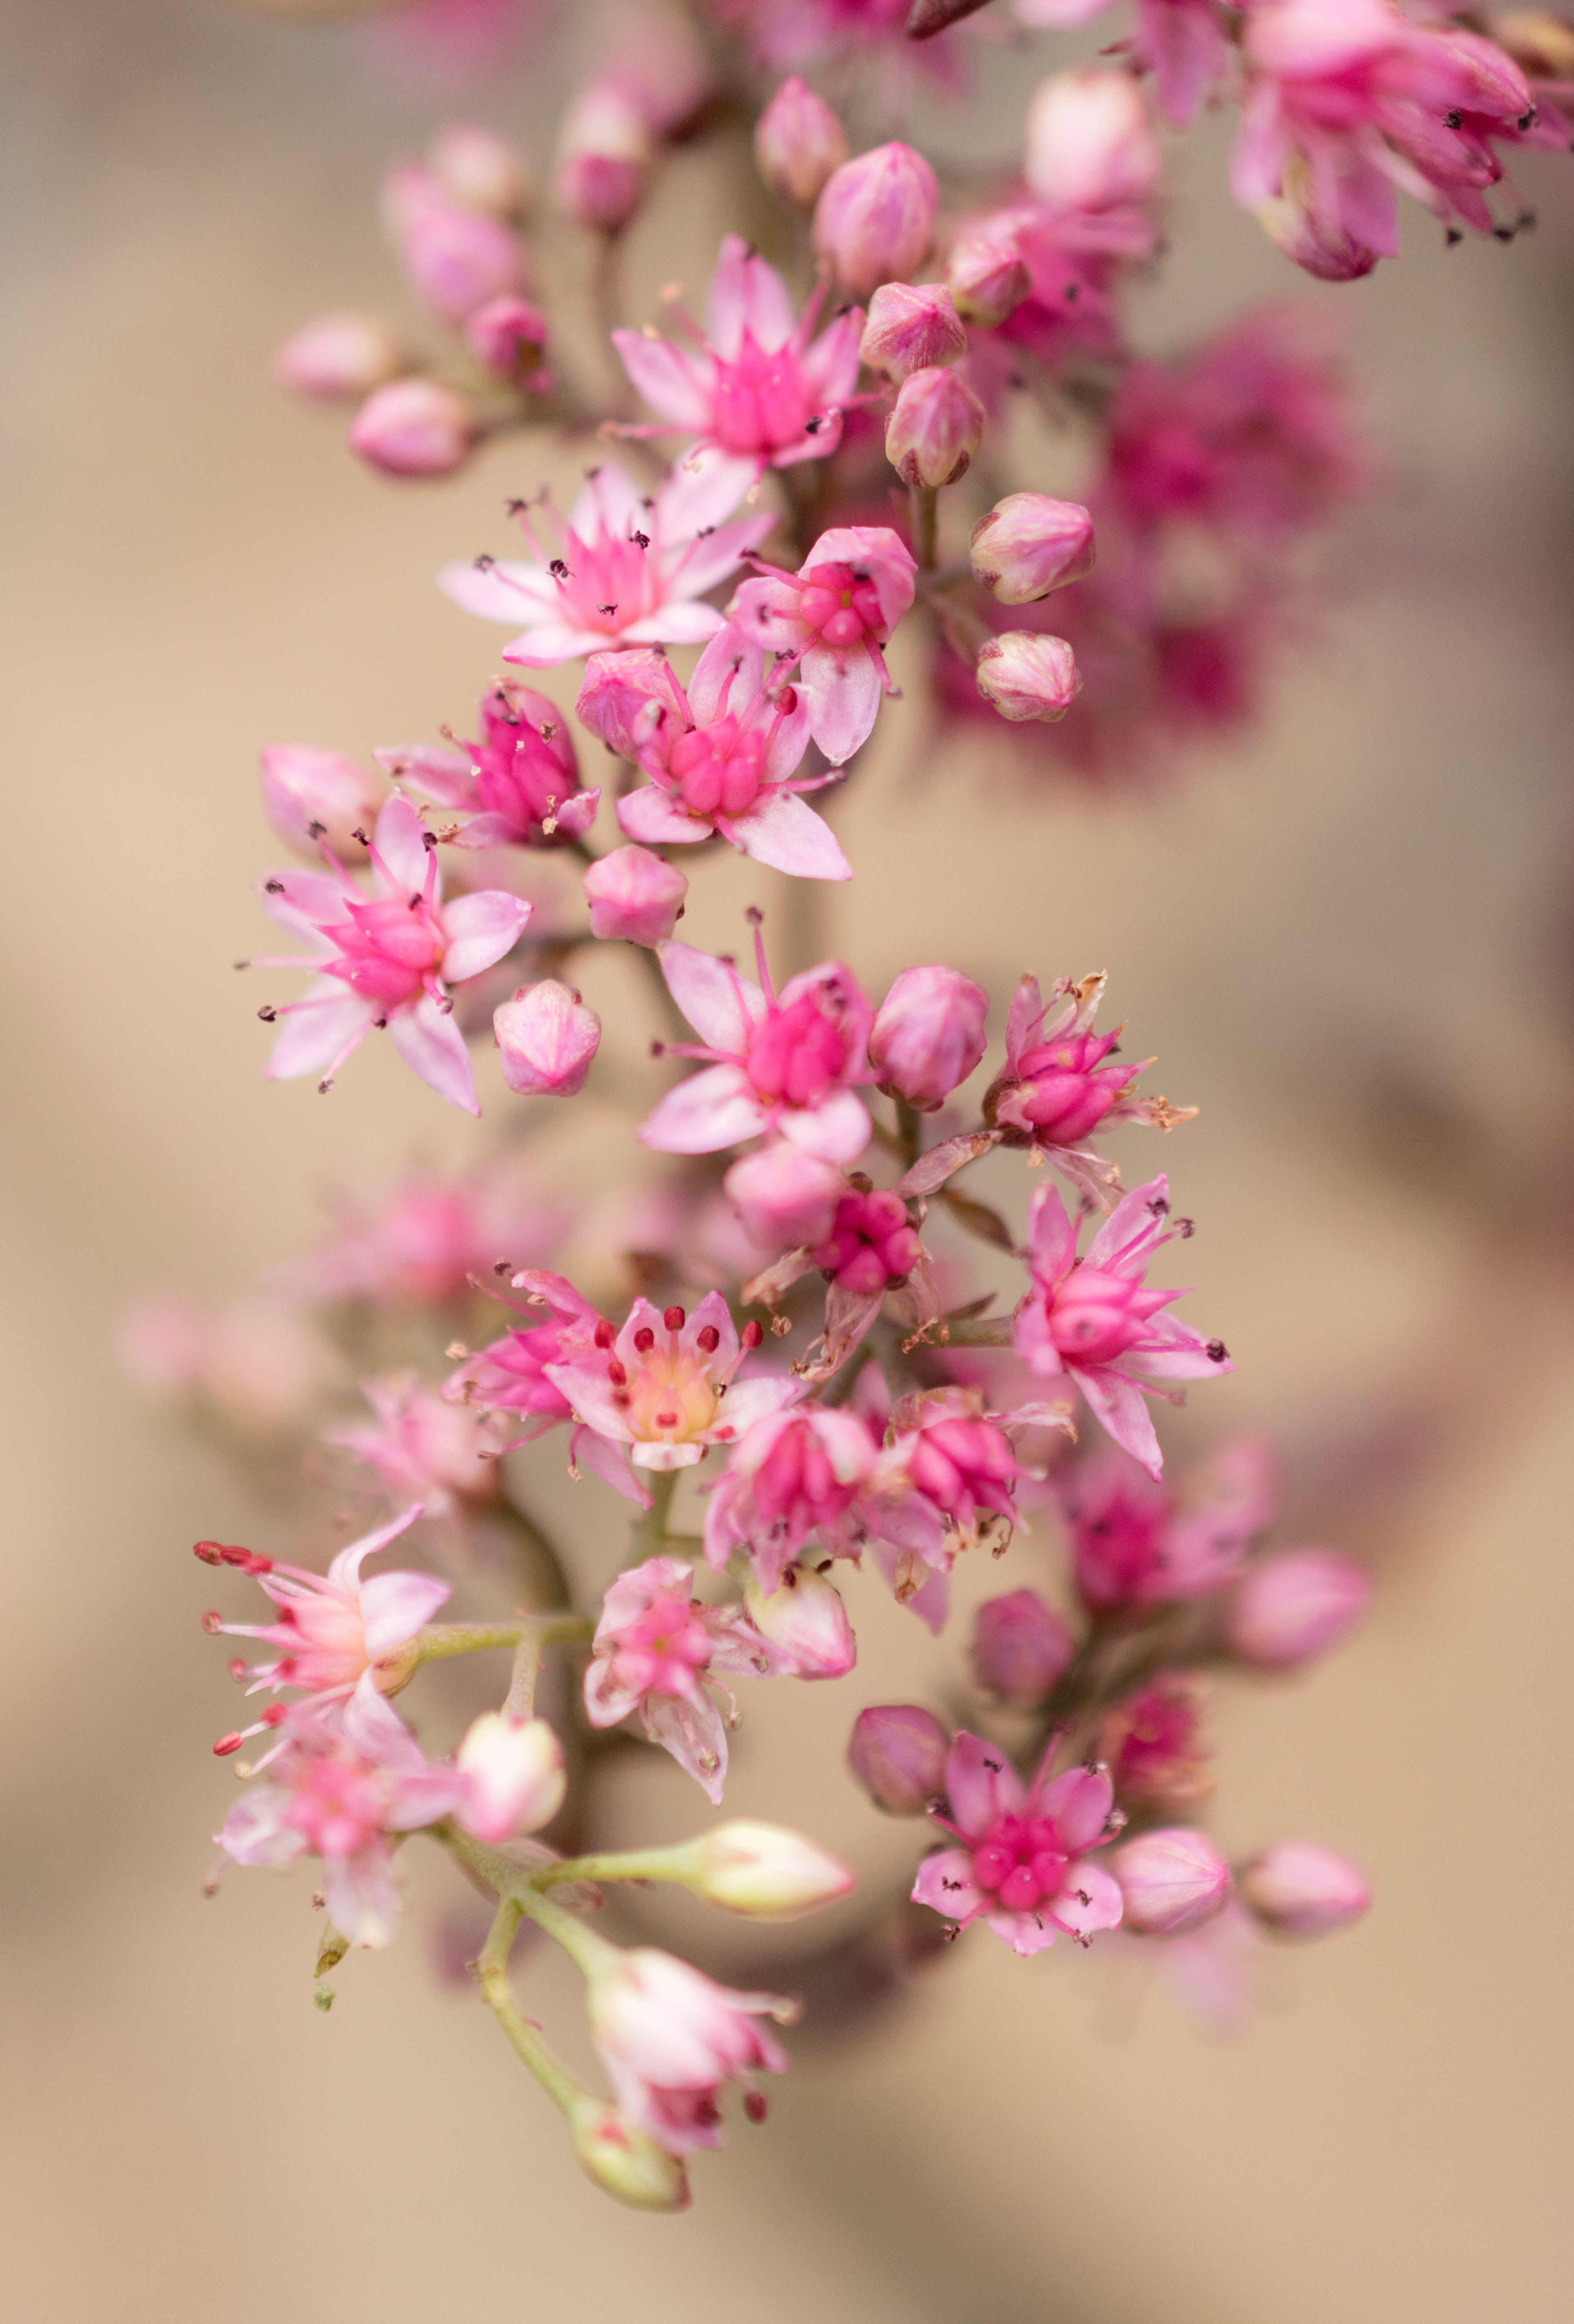 Selective Focus Photography Of Pink Milkweed Flowers